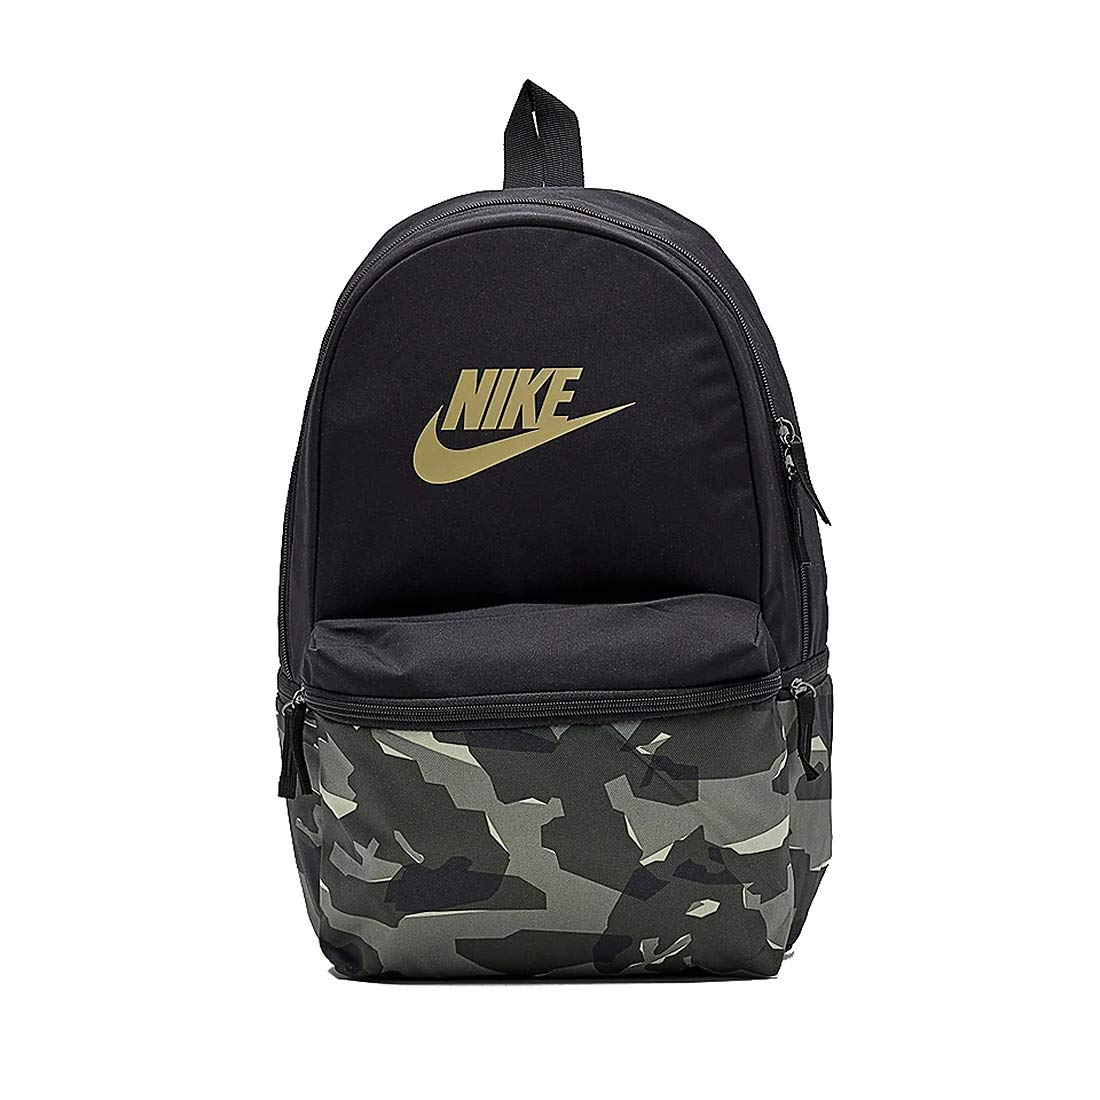 f717e351f8e27 Amazon.com: Nike Heritage Backpack (One Size, Brown): Shoes